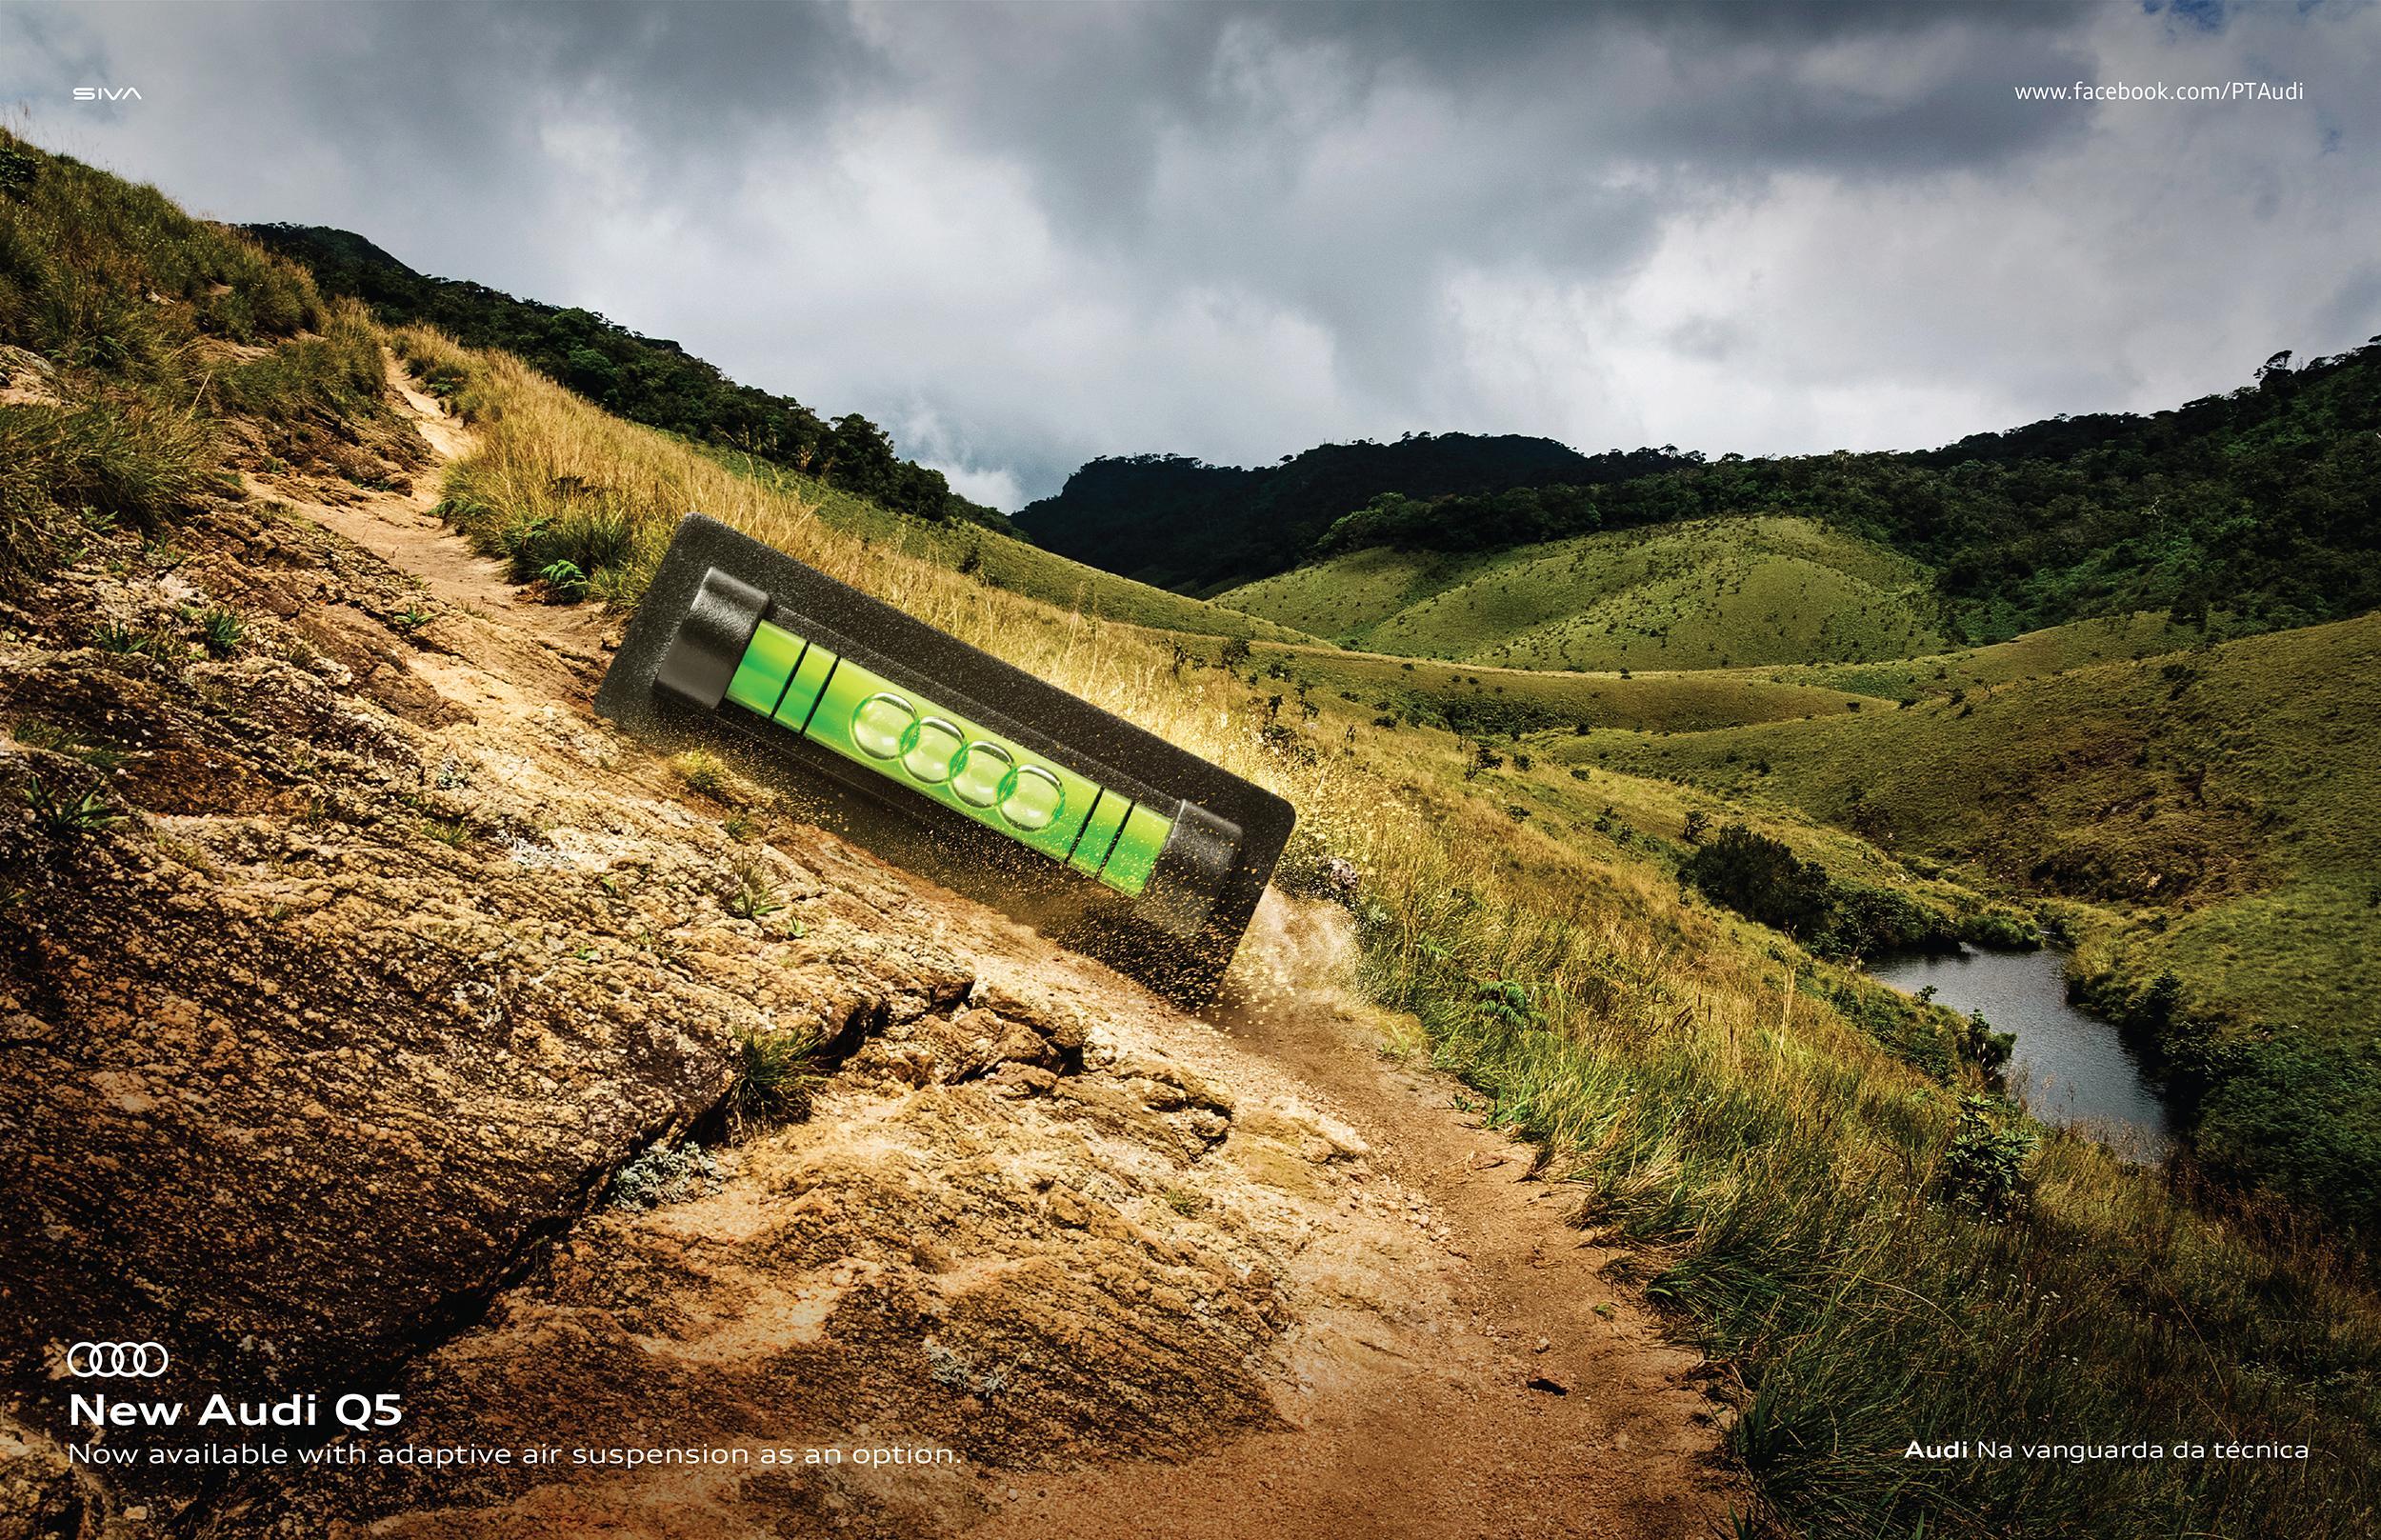 Audi Print Ad - Mountain